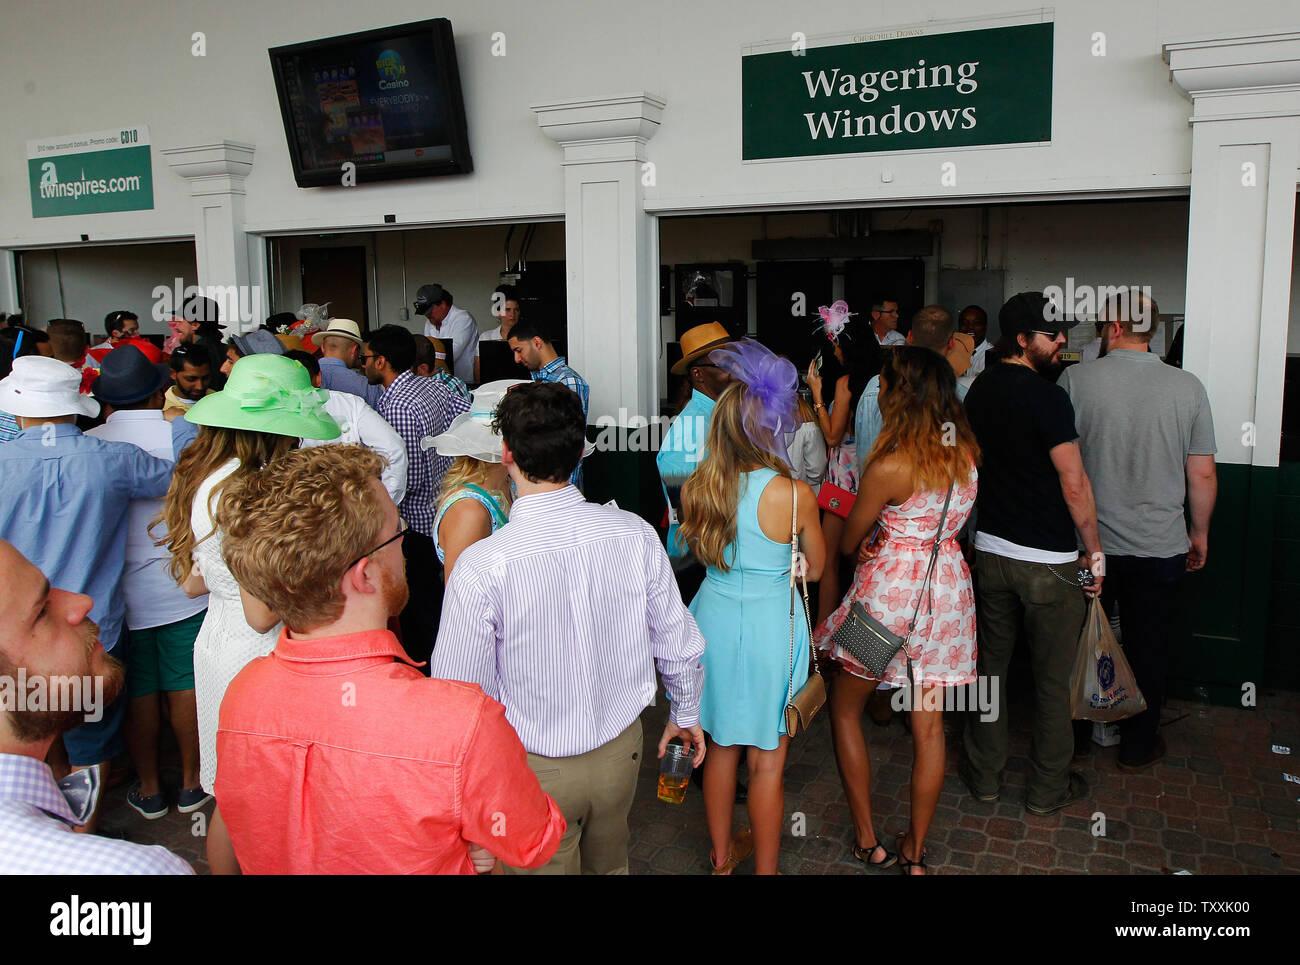 Kentucky derby churchill downs betting windows poker player vs sports betting vs